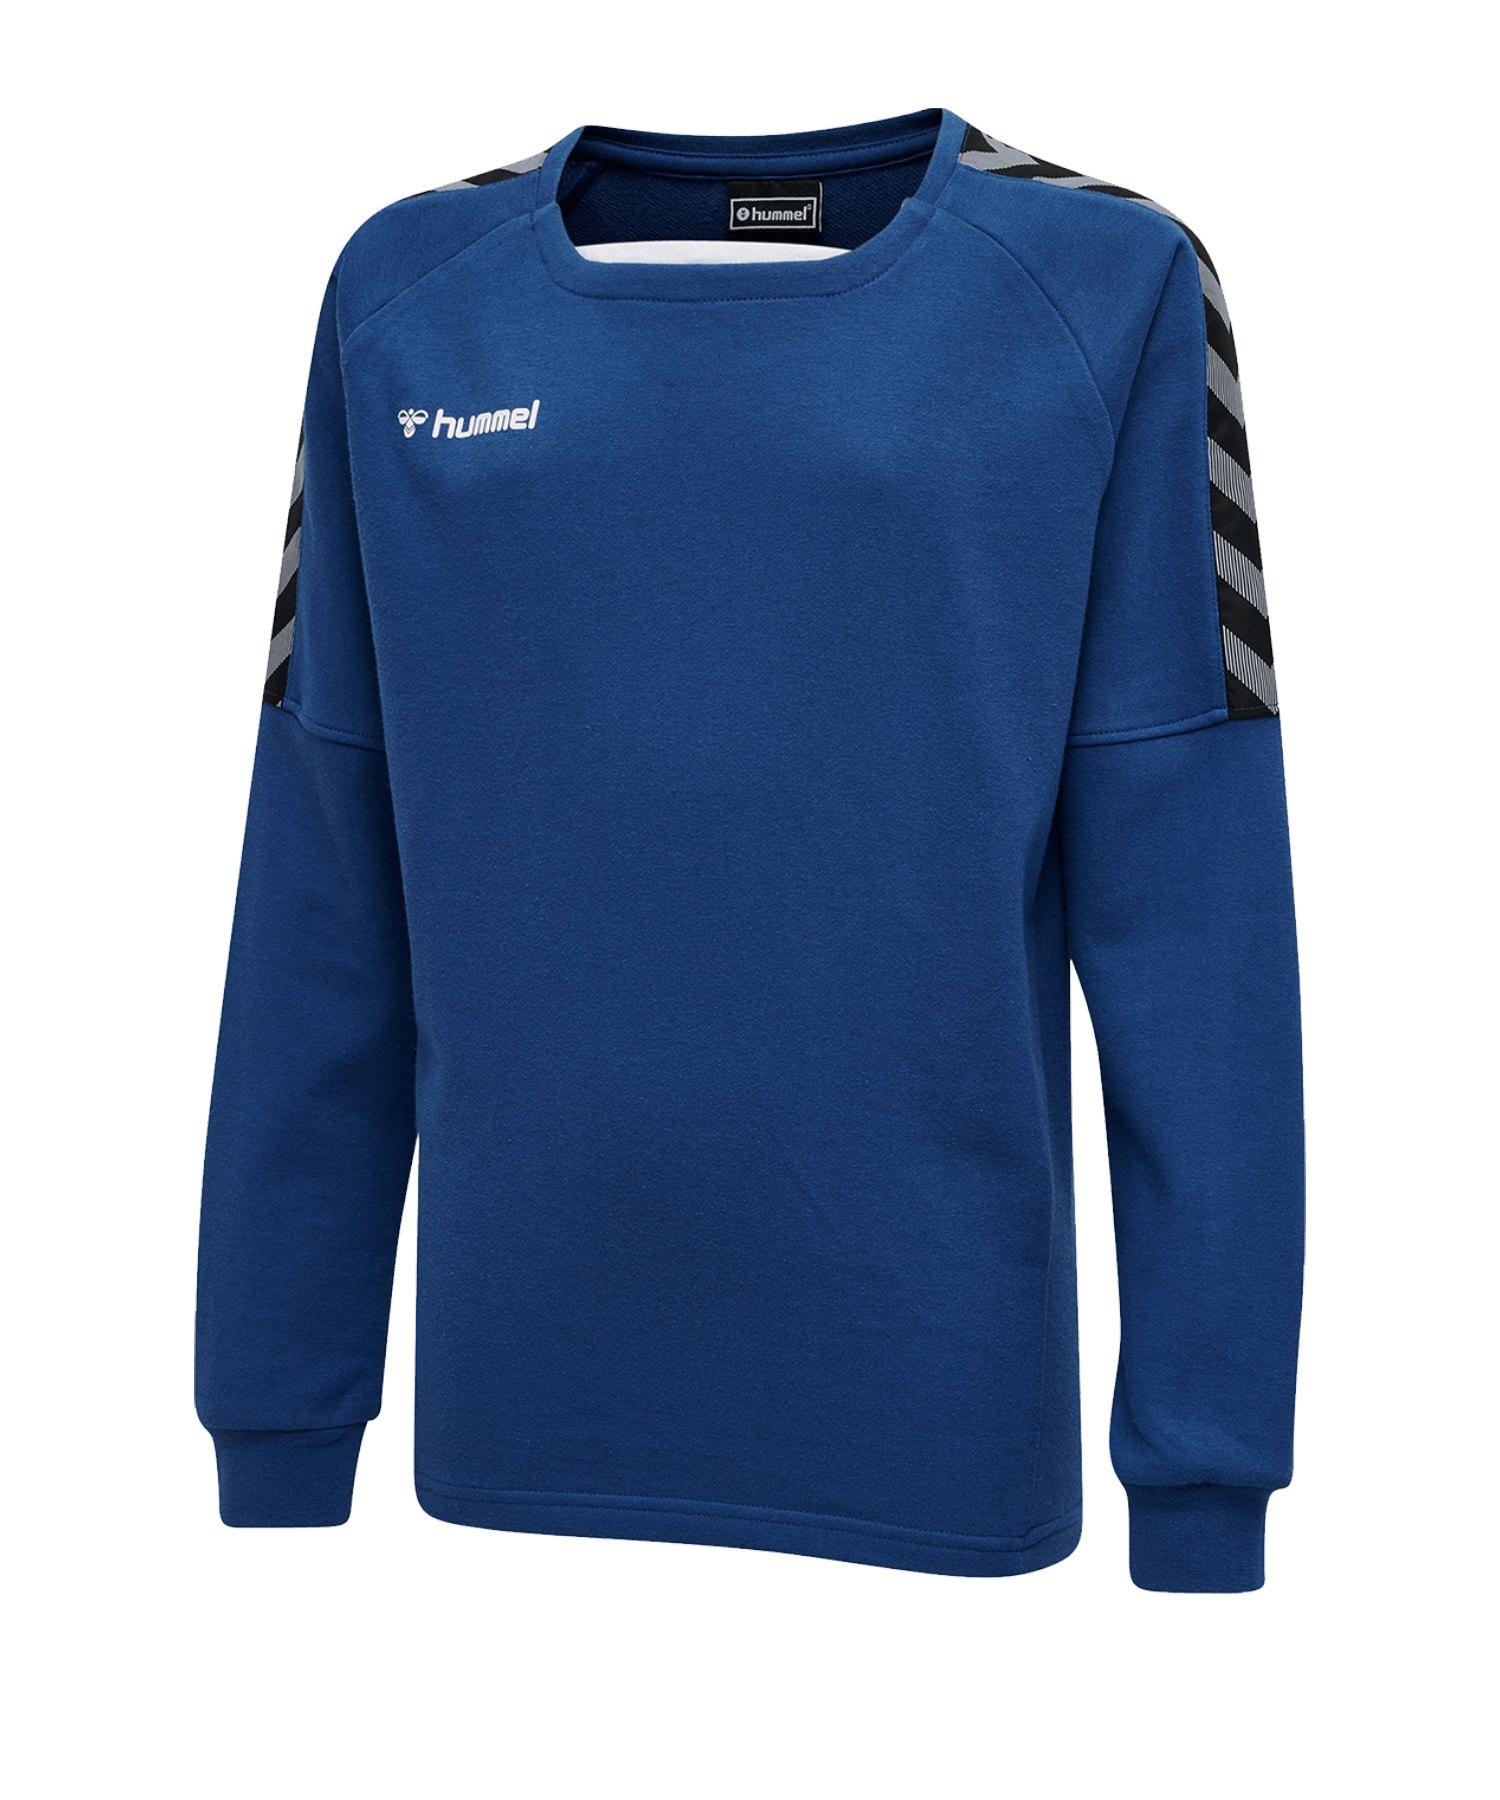 Hummel Authentic Training Sweatshirt Kids F7045 - blau